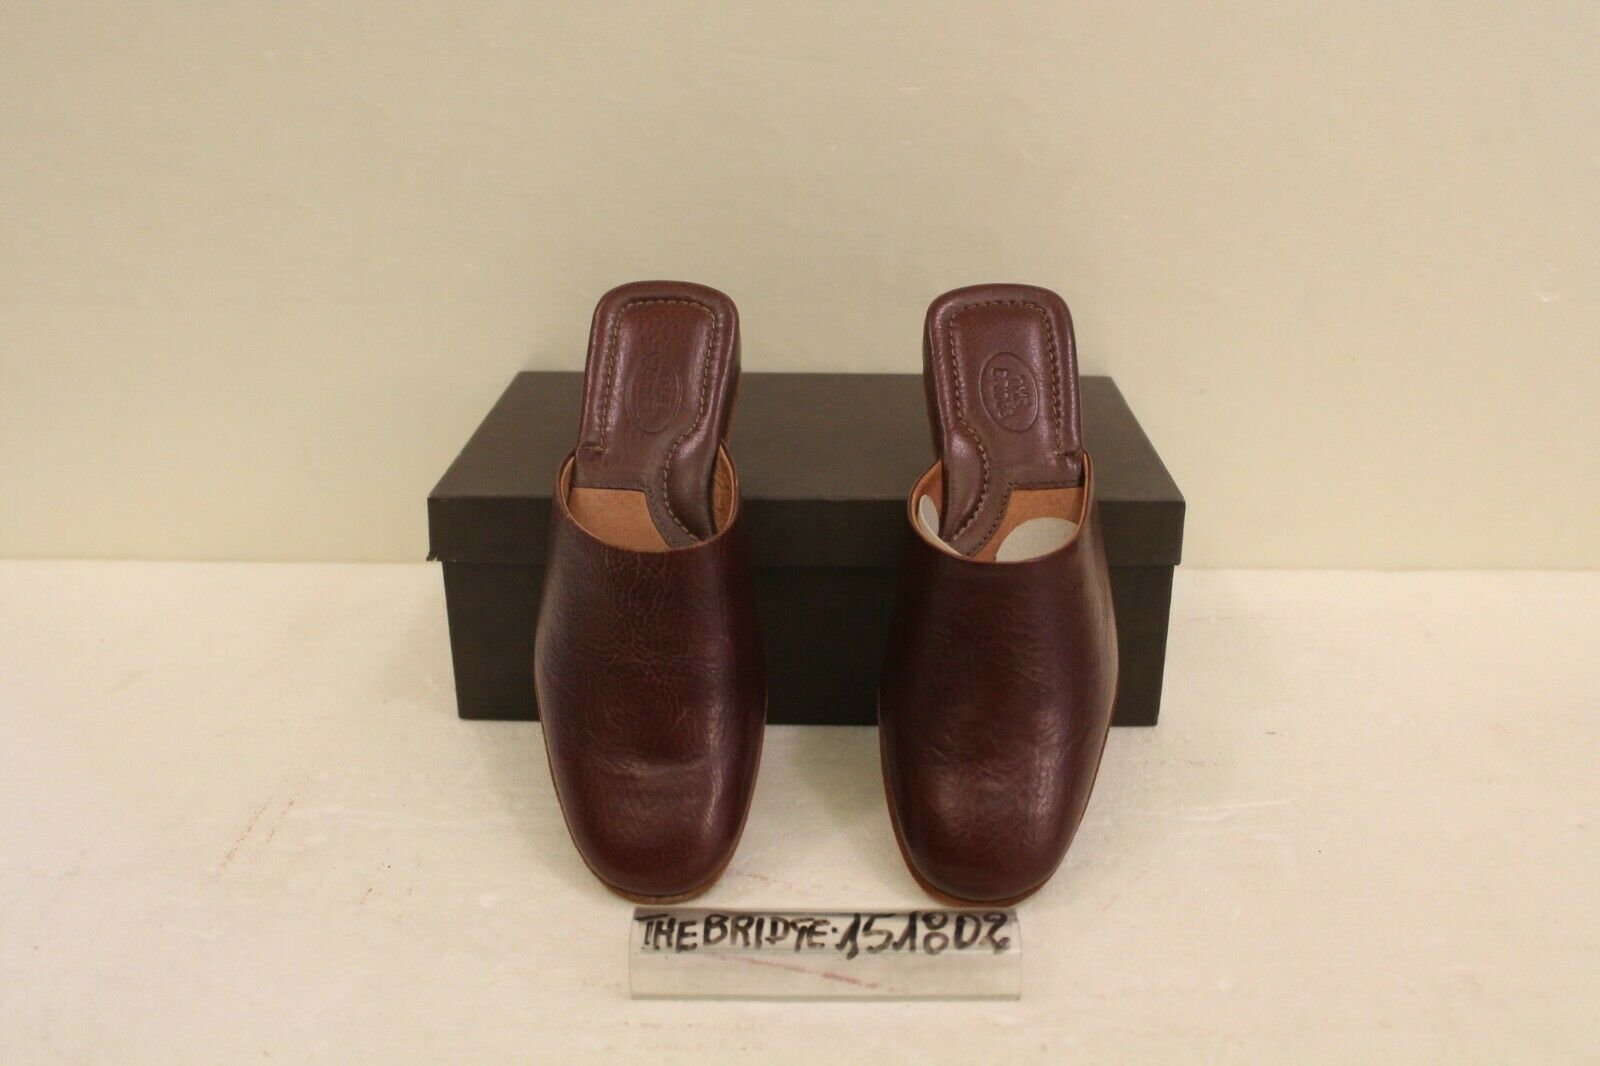 Pantofole in Pelle- Marronee- COD.151802 The Bridge